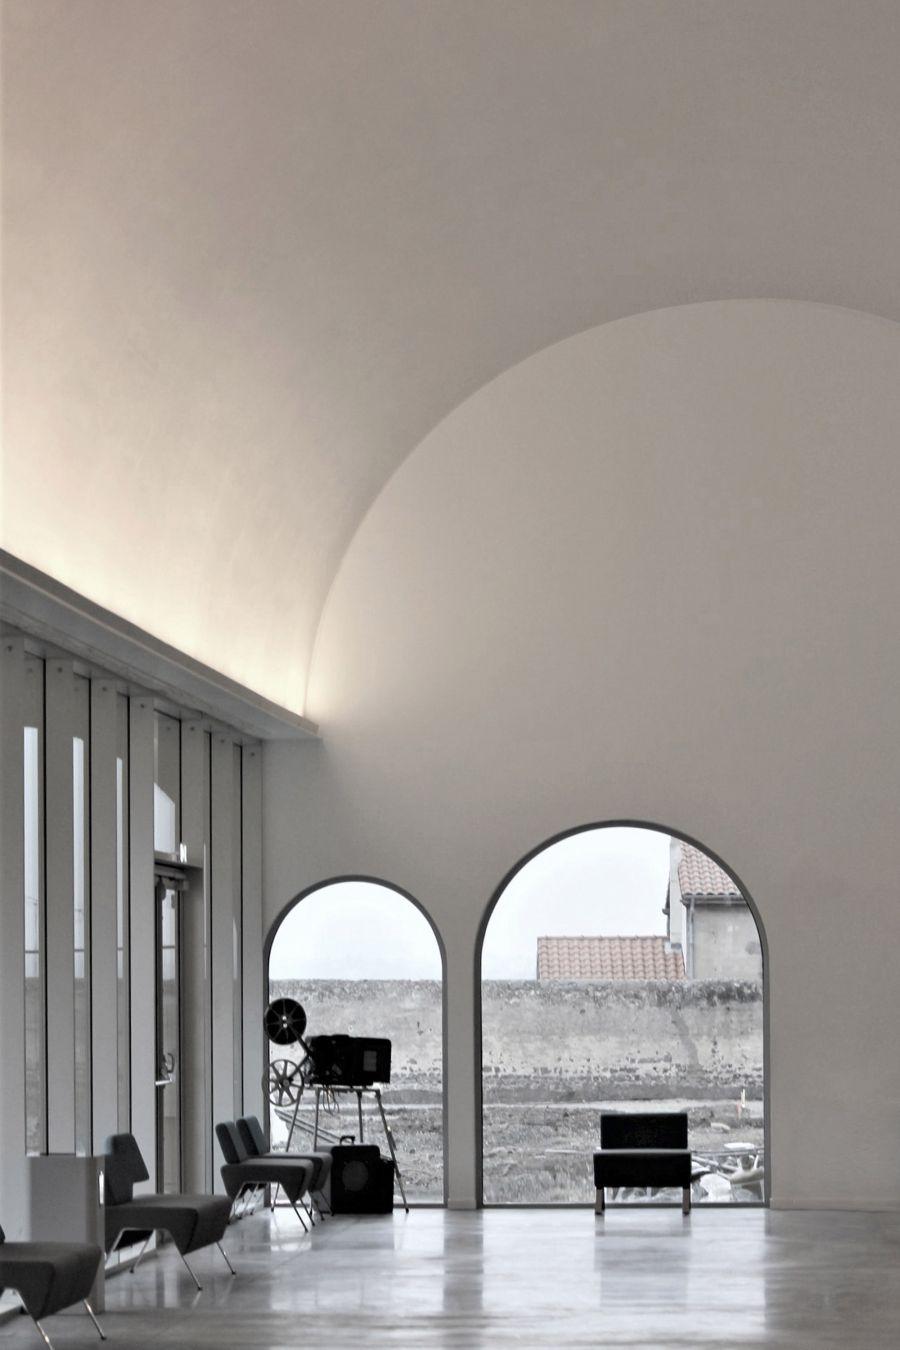 Cinema de Riom - Arch. Tracks architecte © Guillaume Amat